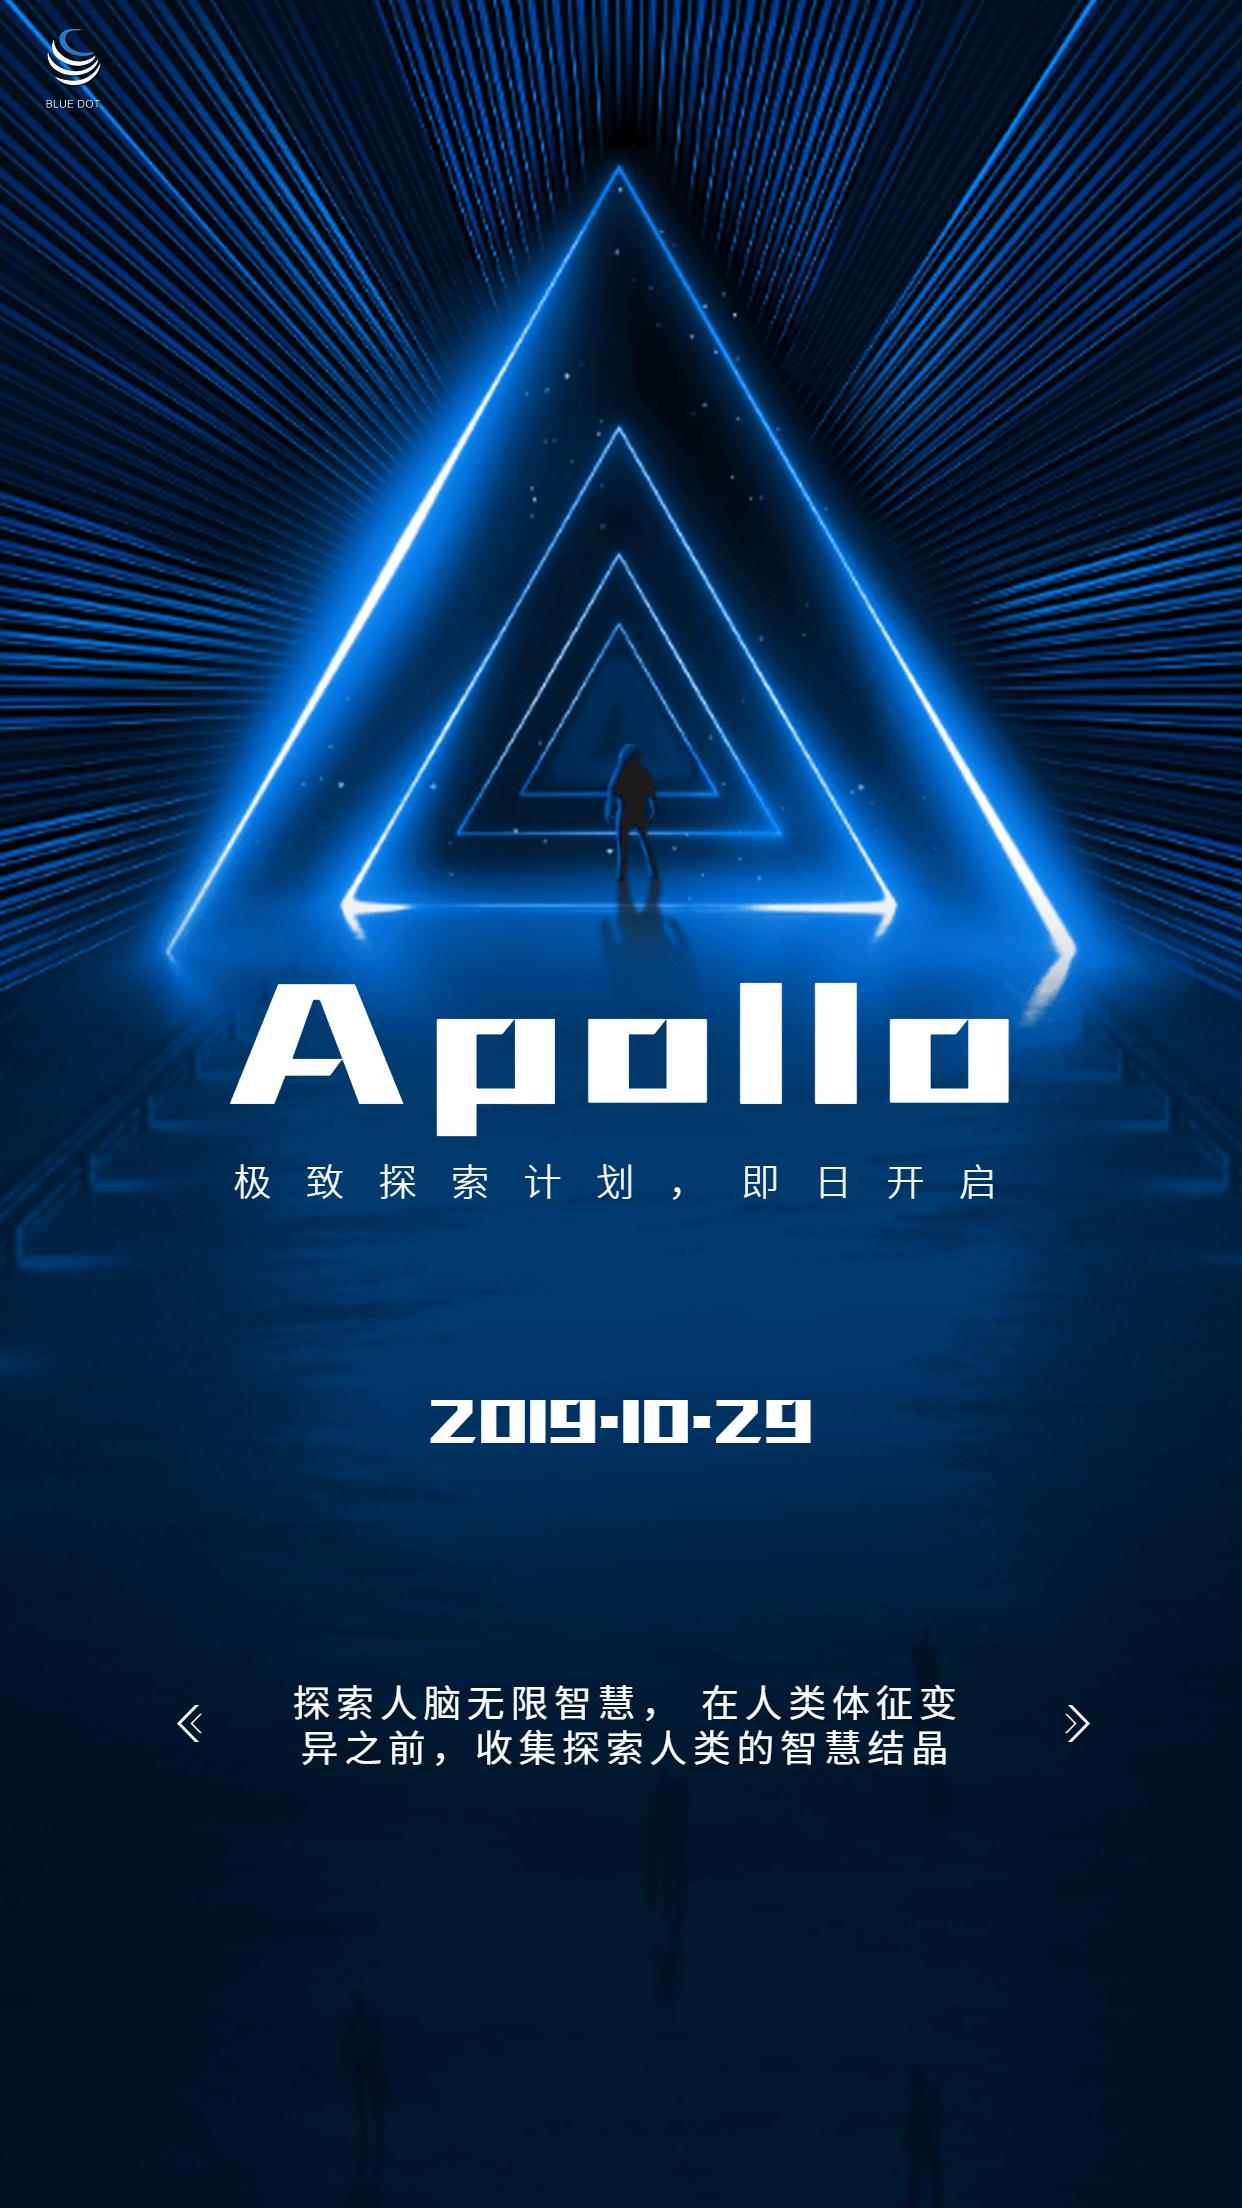 Apollo,极致探索计划,即日开启-BlueDotCC, 蓝点文化创意